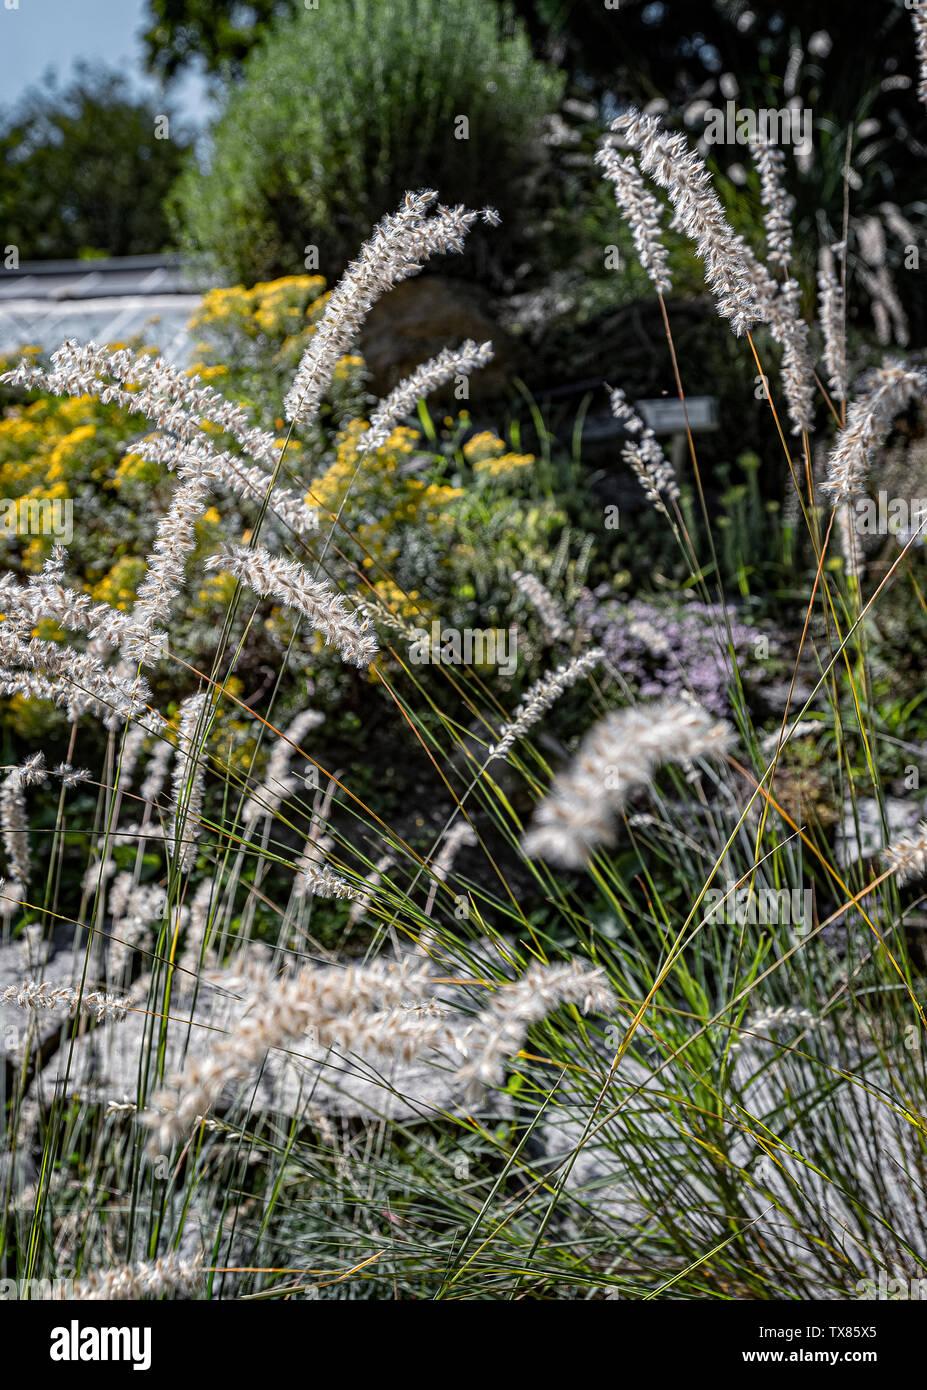 Italy Piedmont Turin Valentino botanical garden - Graminaceae - Melica Ciliata L. Stock Photo